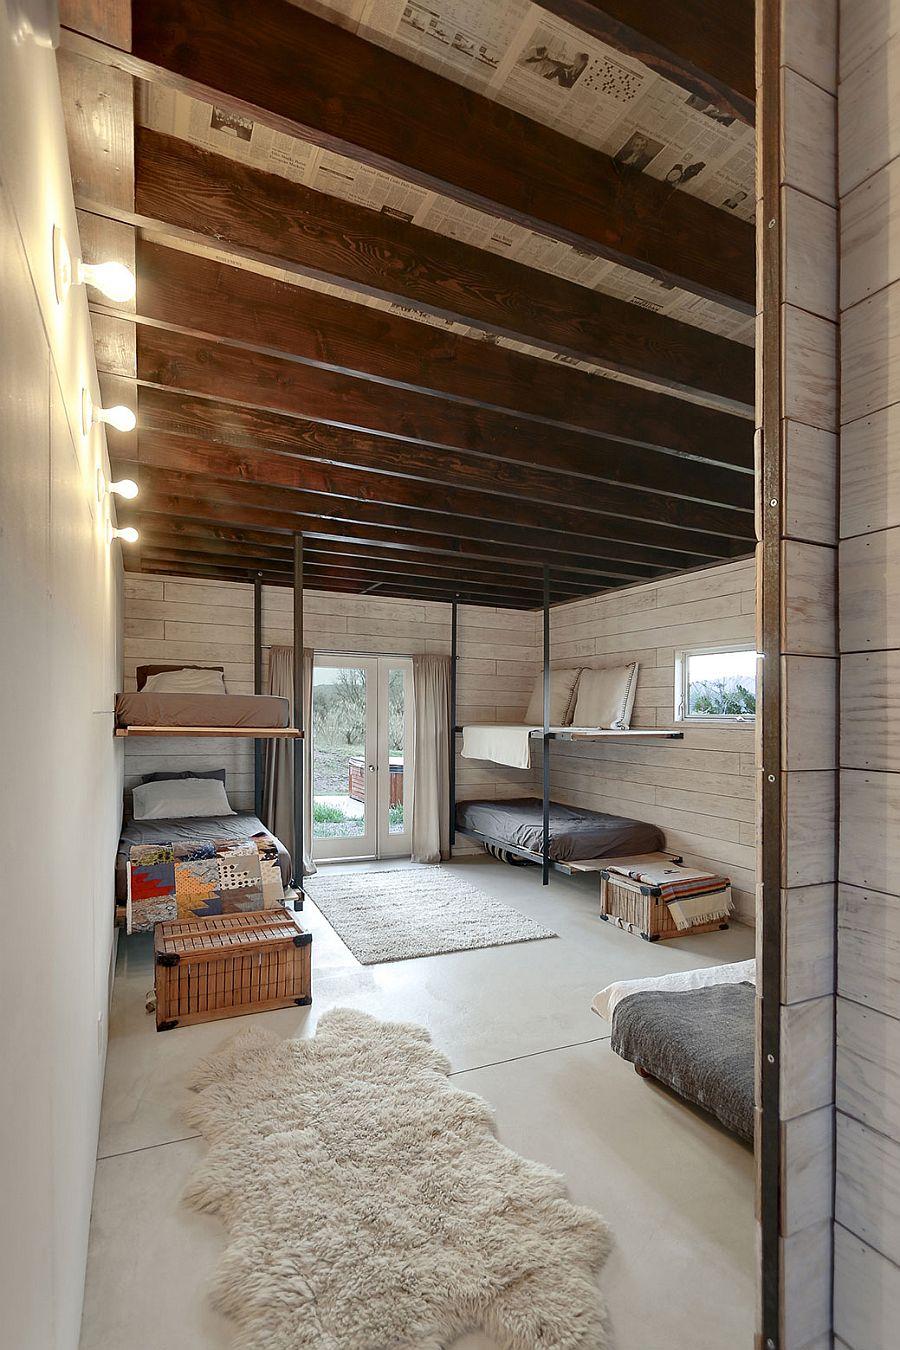 Bunk bedding inside the 510 cabin